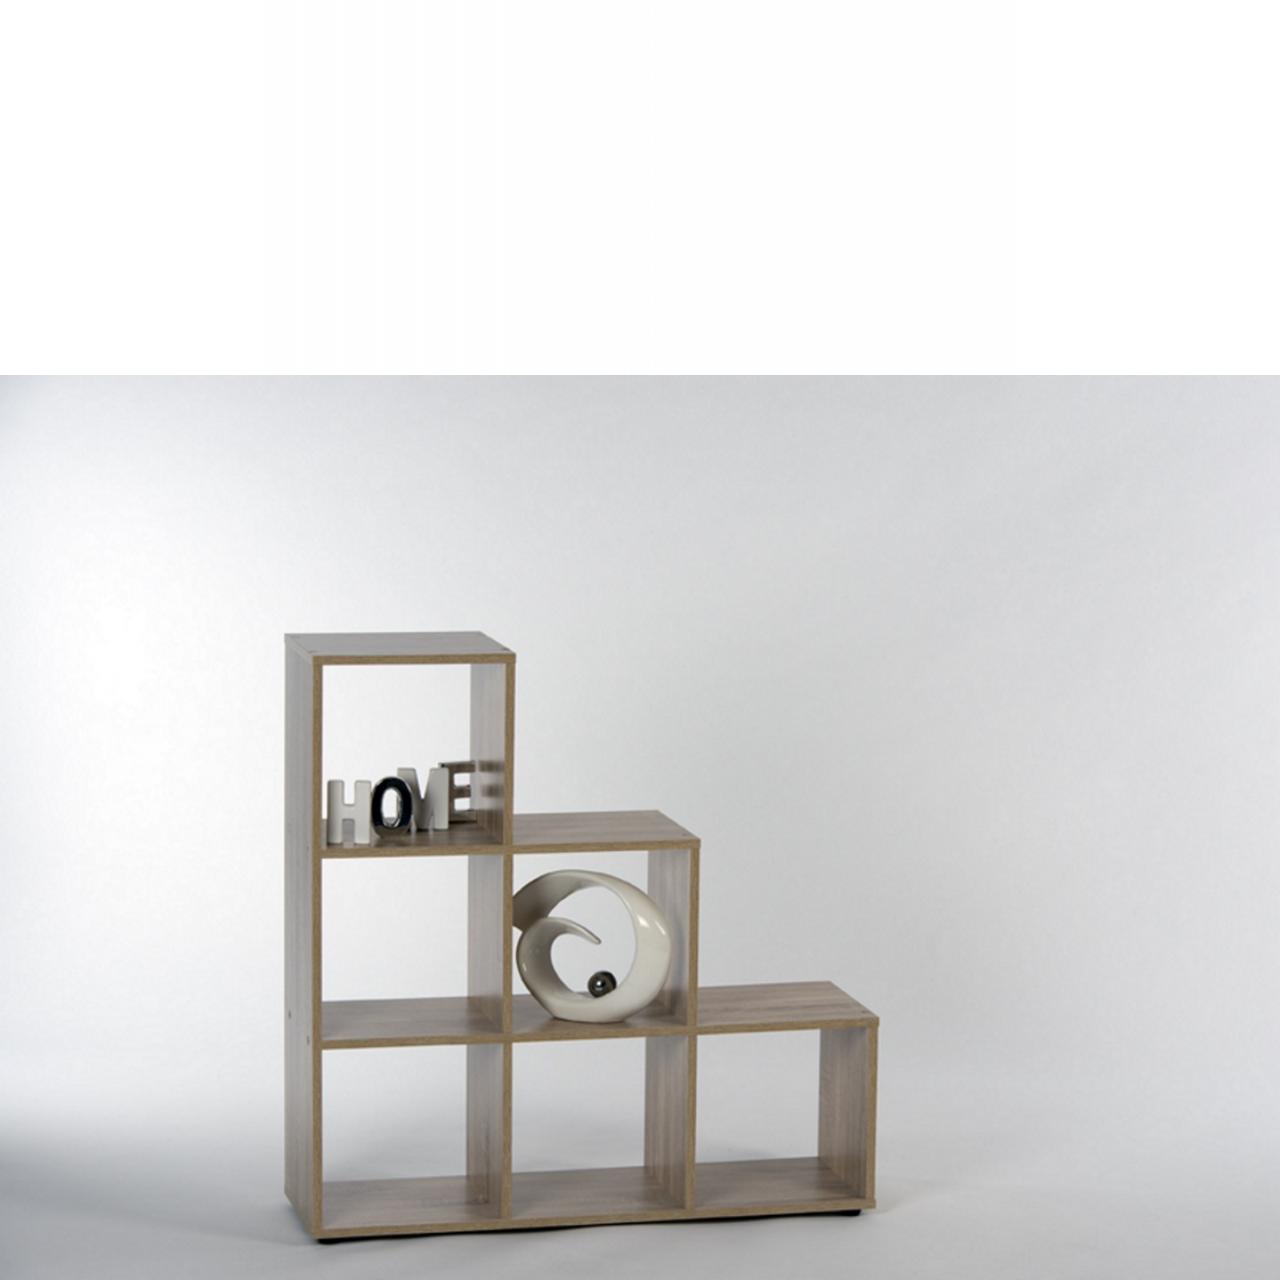 eiche regal perfect nemann vechta rume badezimmer regale raumteiler badezimmer with eiche regal. Black Bedroom Furniture Sets. Home Design Ideas